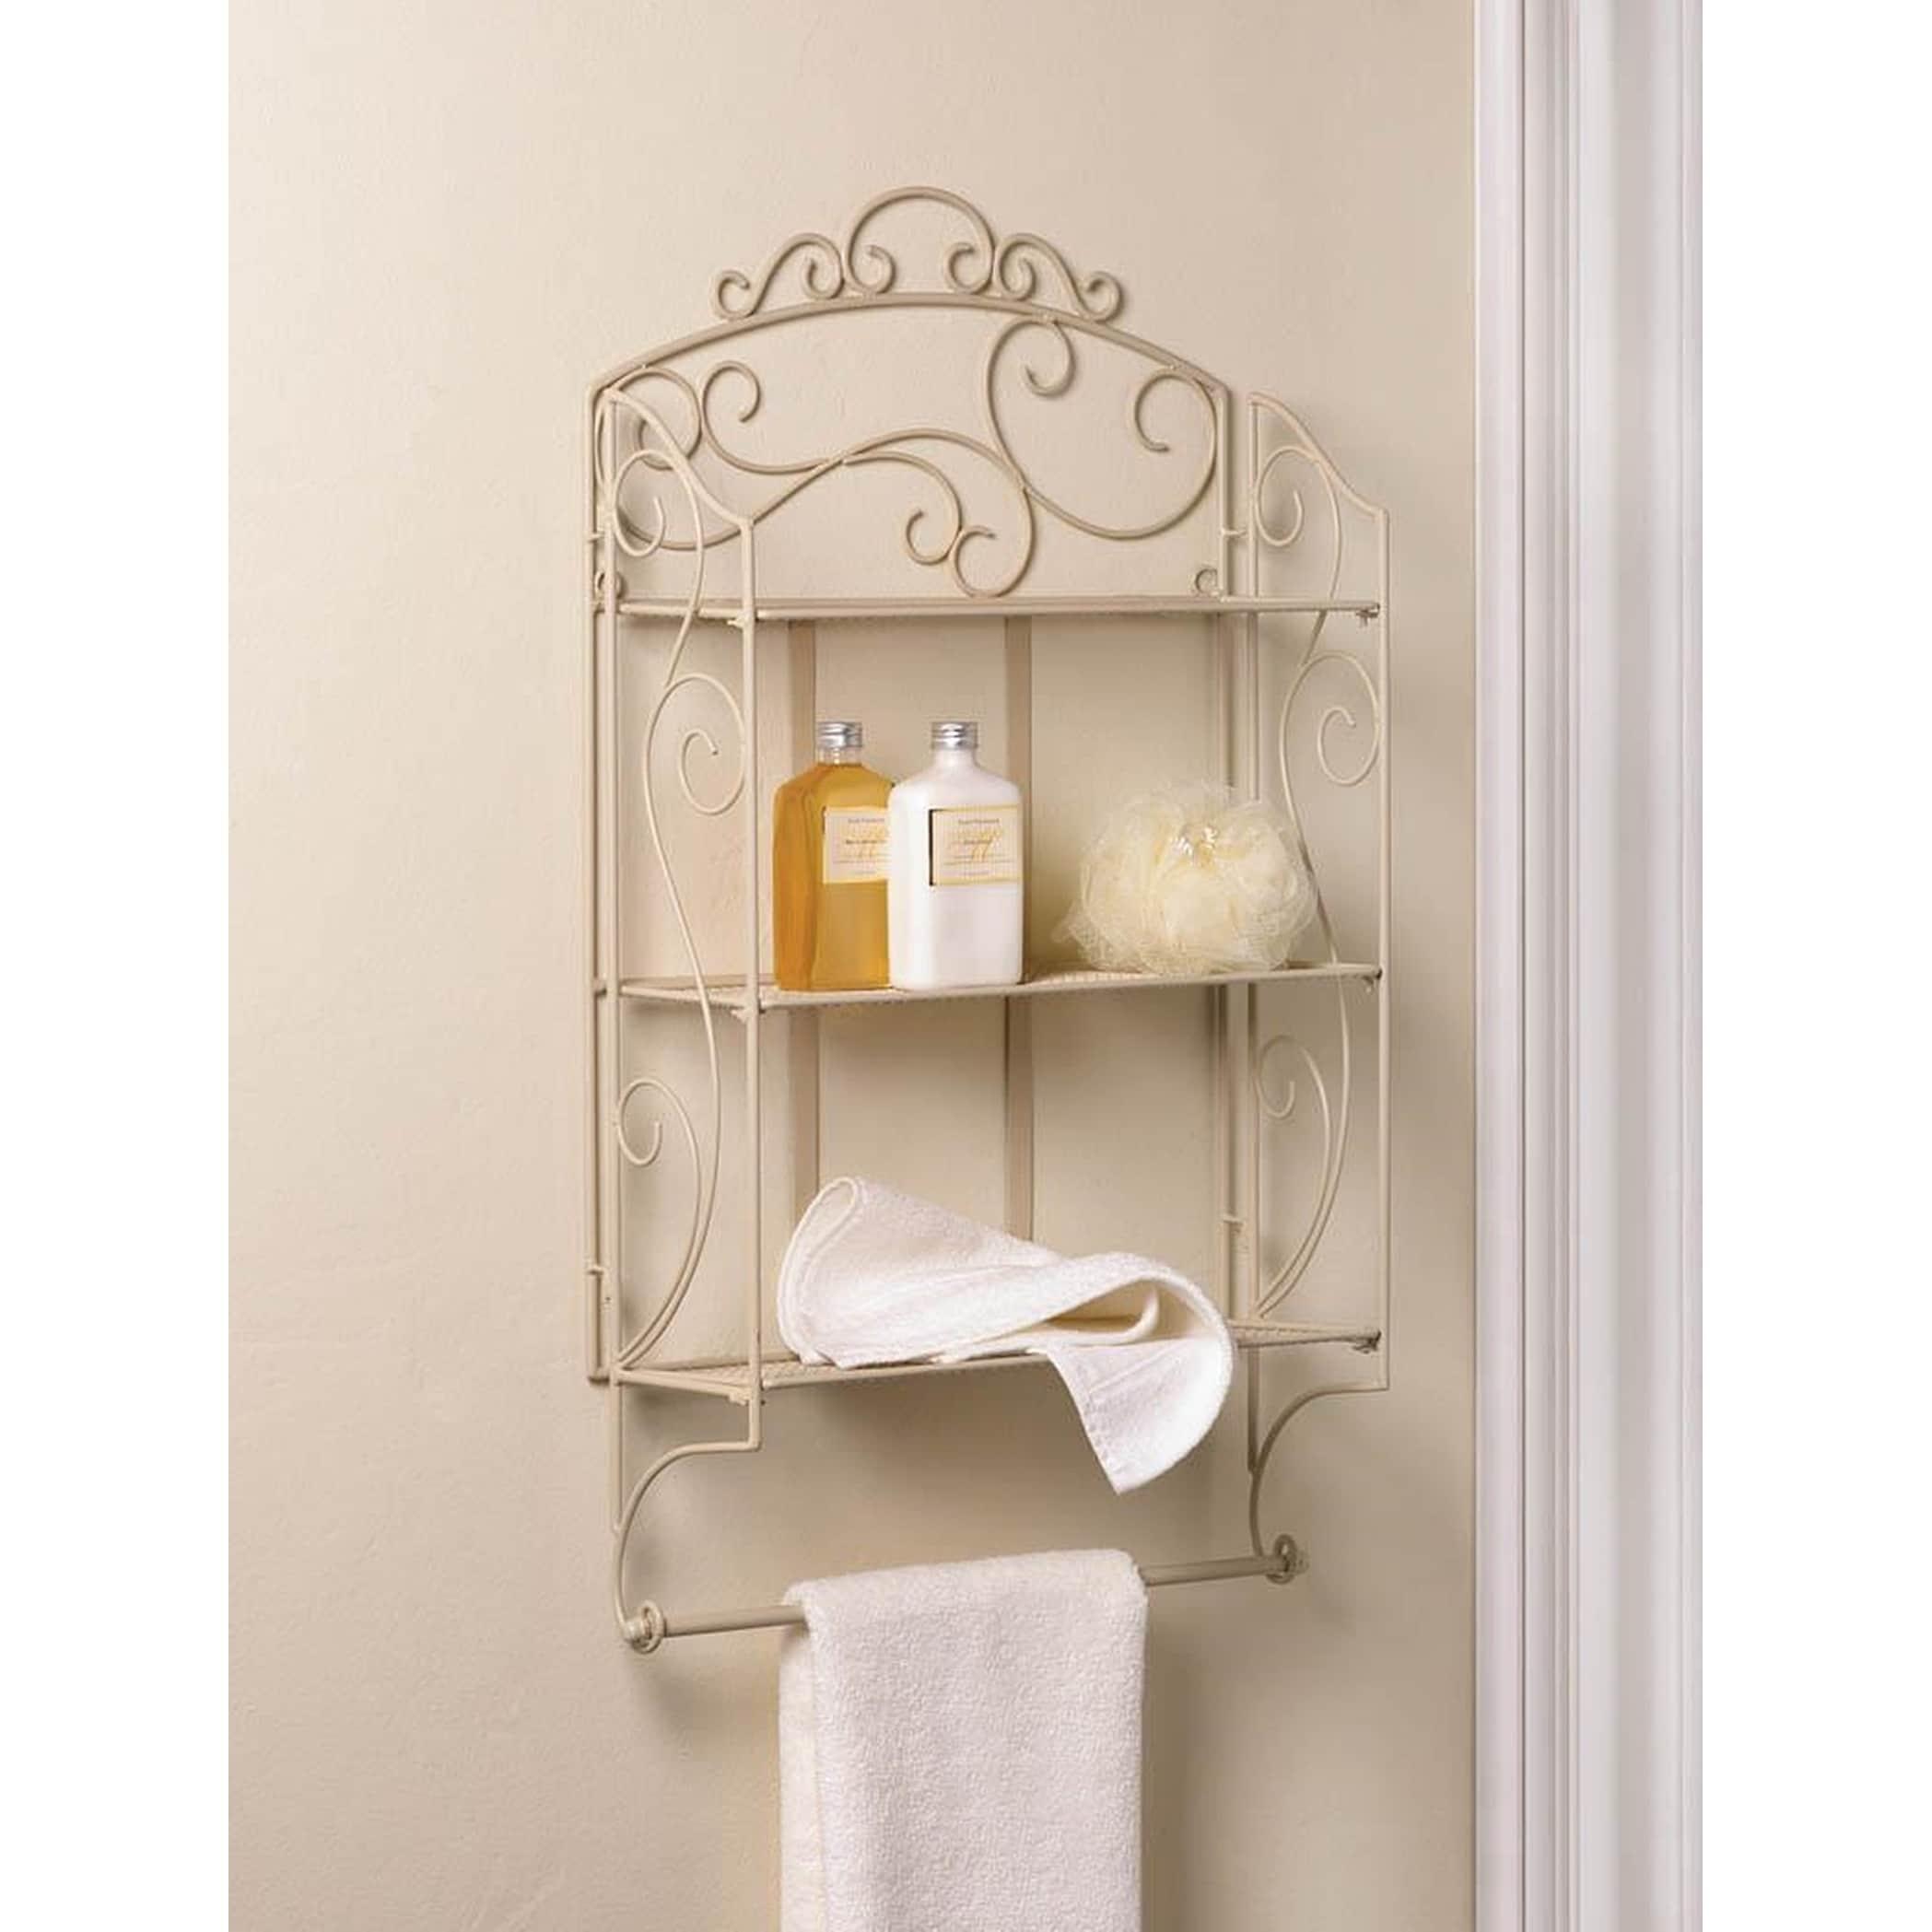 Decorative White Flourish Wall Shelf with Hooks